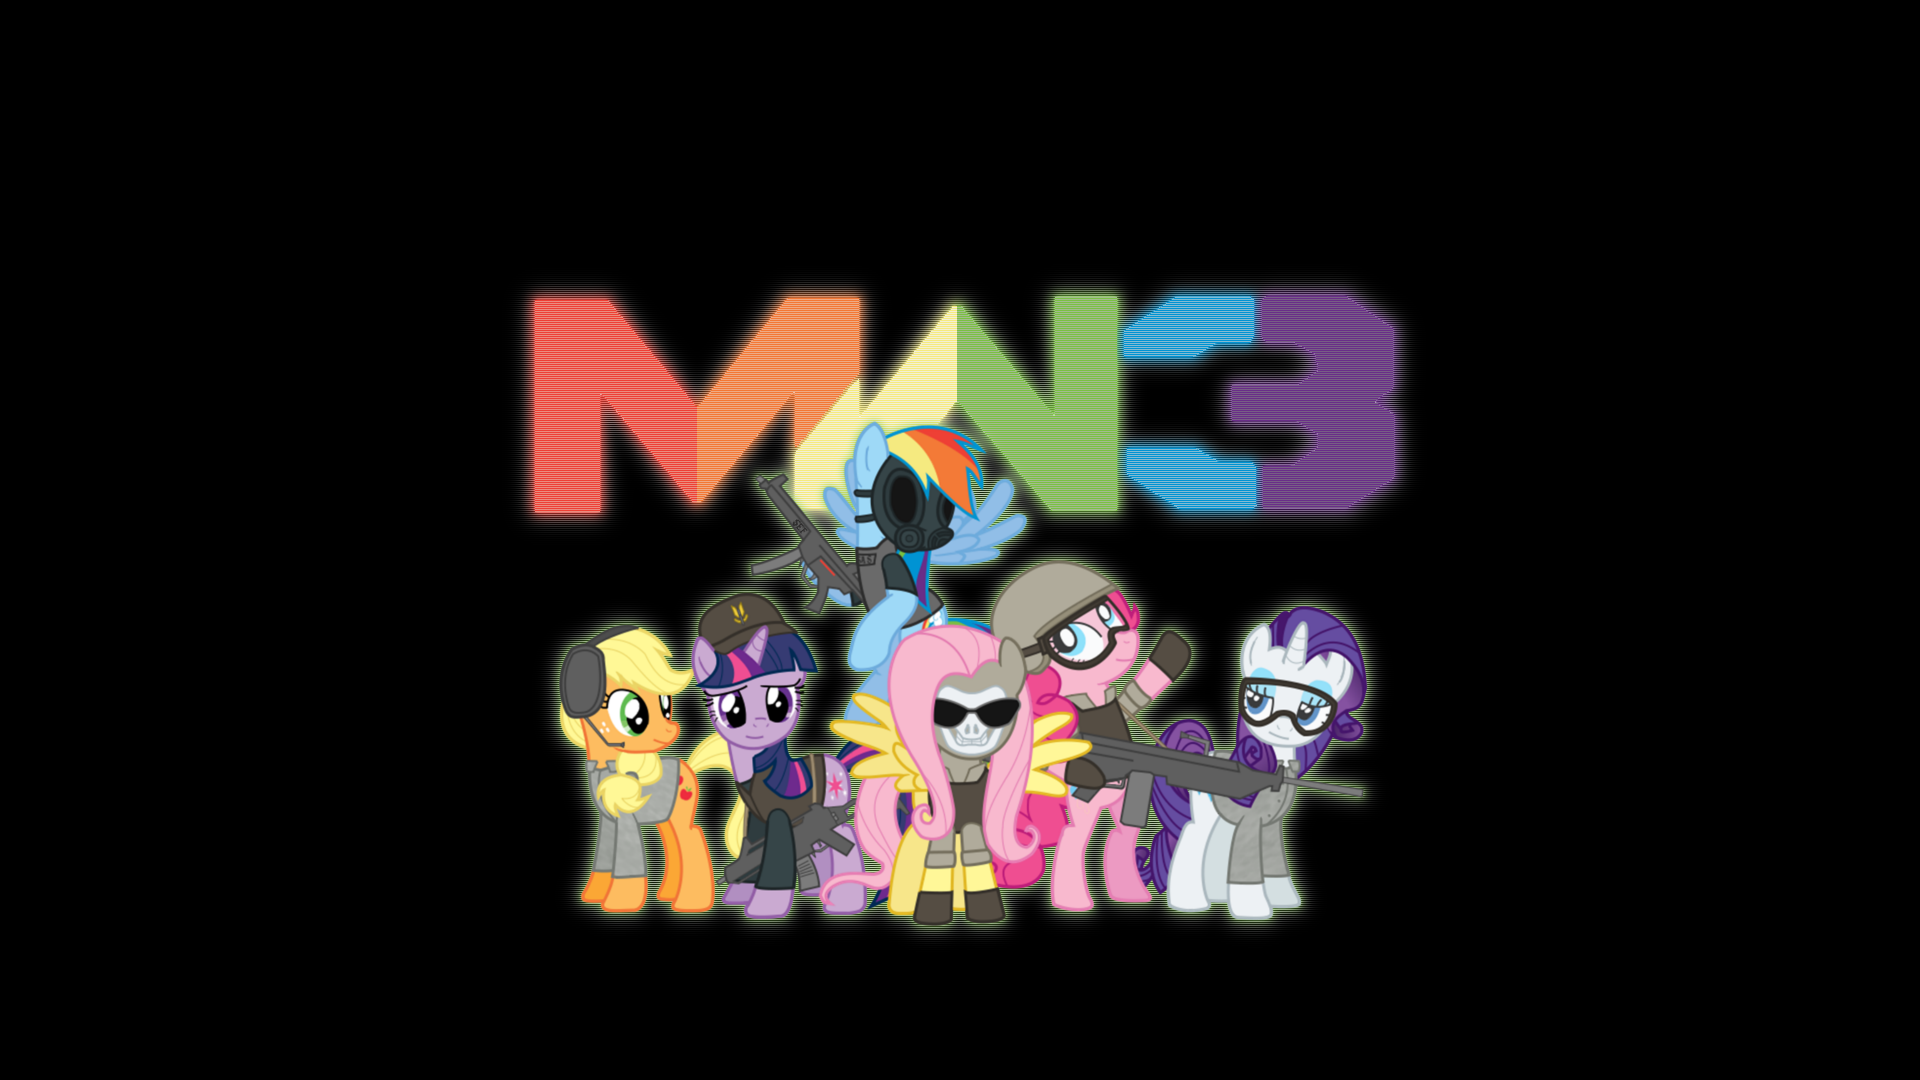 My Little Pony Mw3 Pony 430043 Hd Wallpaper Backgrounds